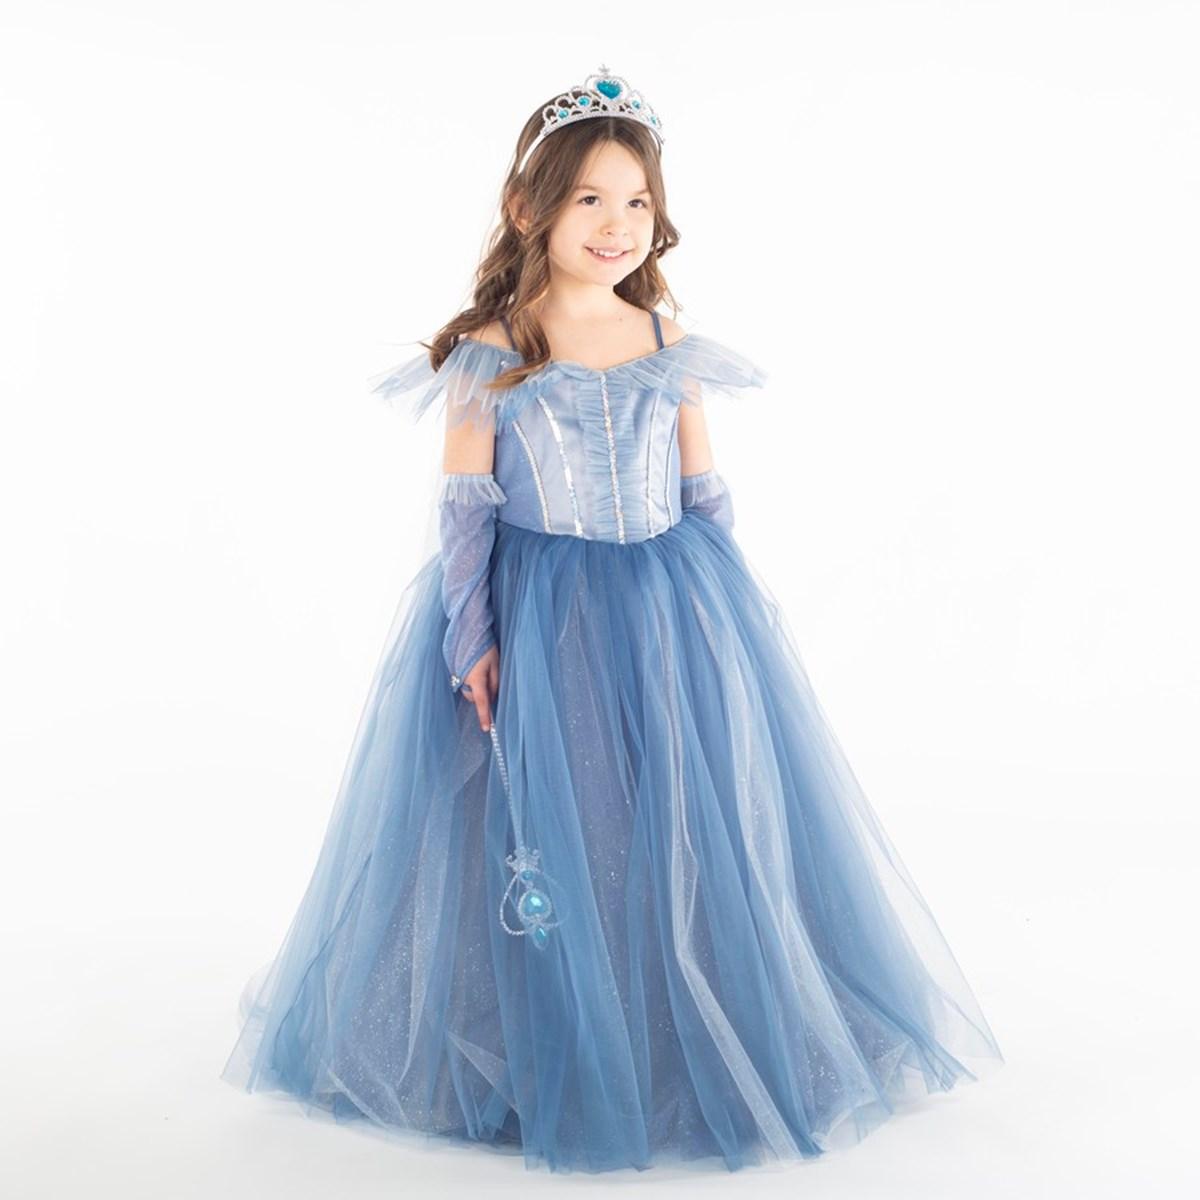 9352 Mavi Kostüm 1